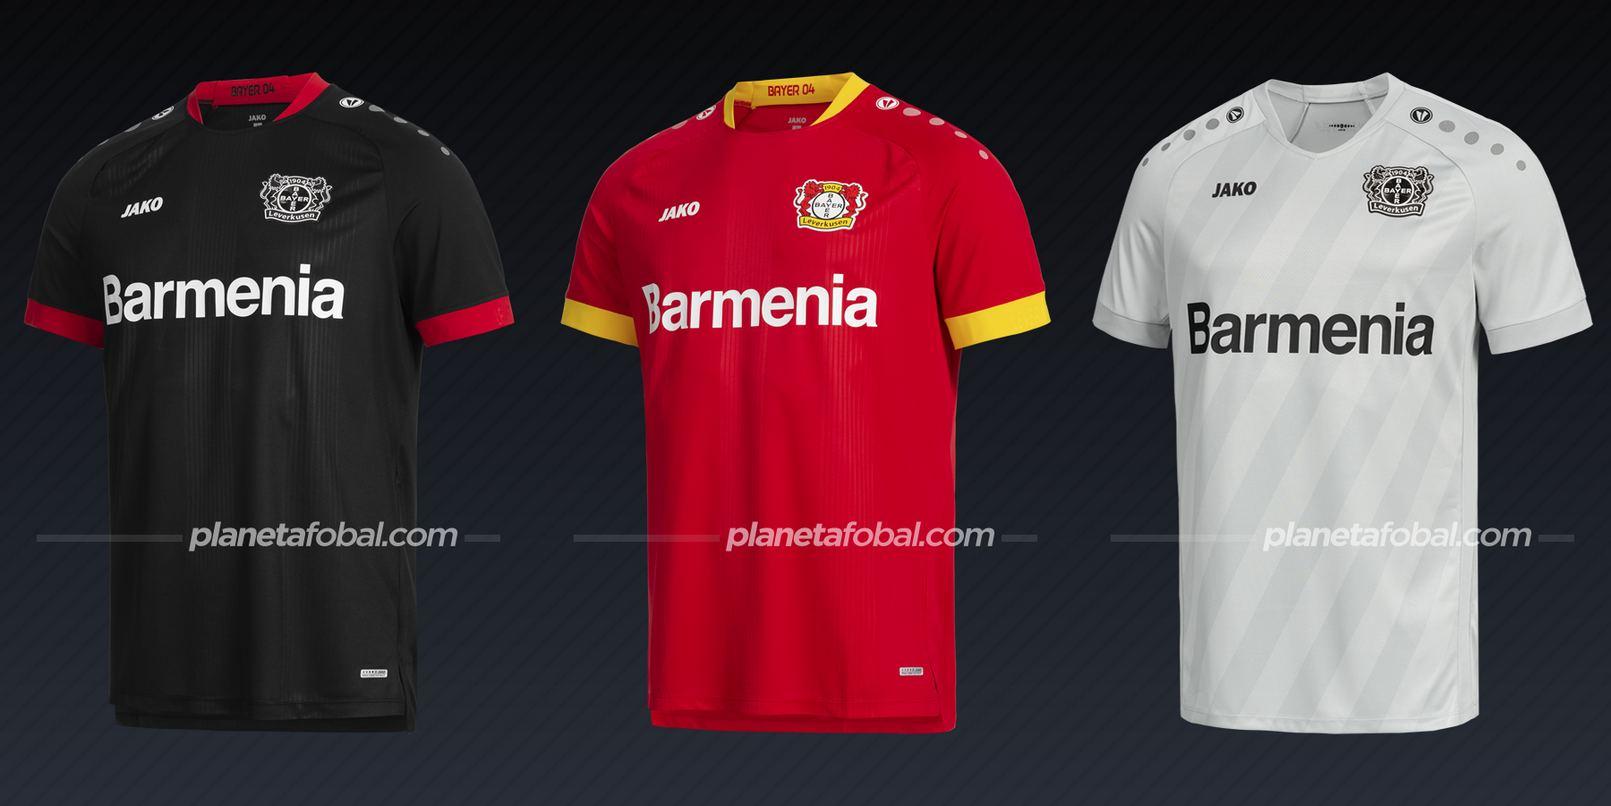 Bayer 04 (Jako) | Camisetas de la Bundesliga 2020/2021